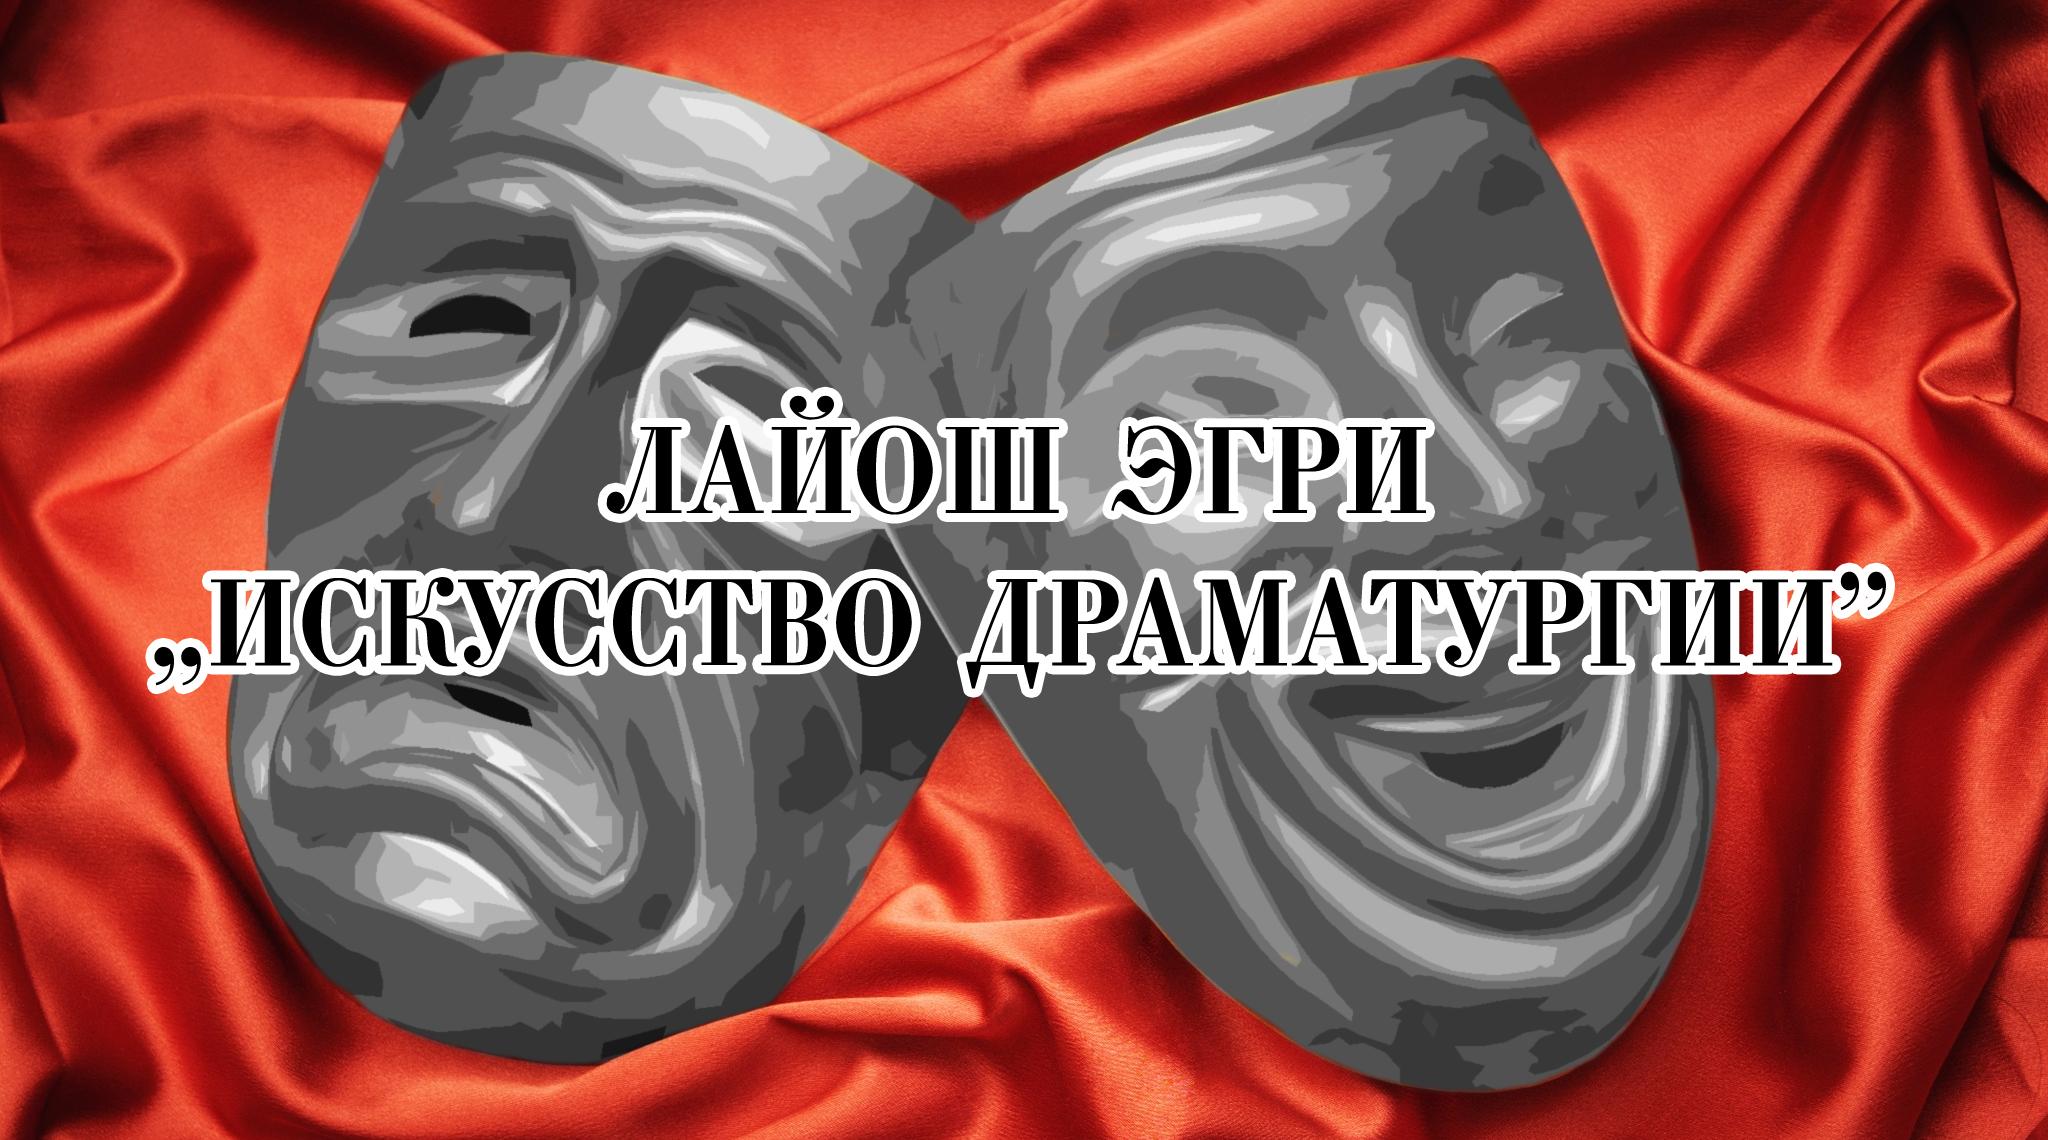 Лайош Эгри. Искусство драматургии